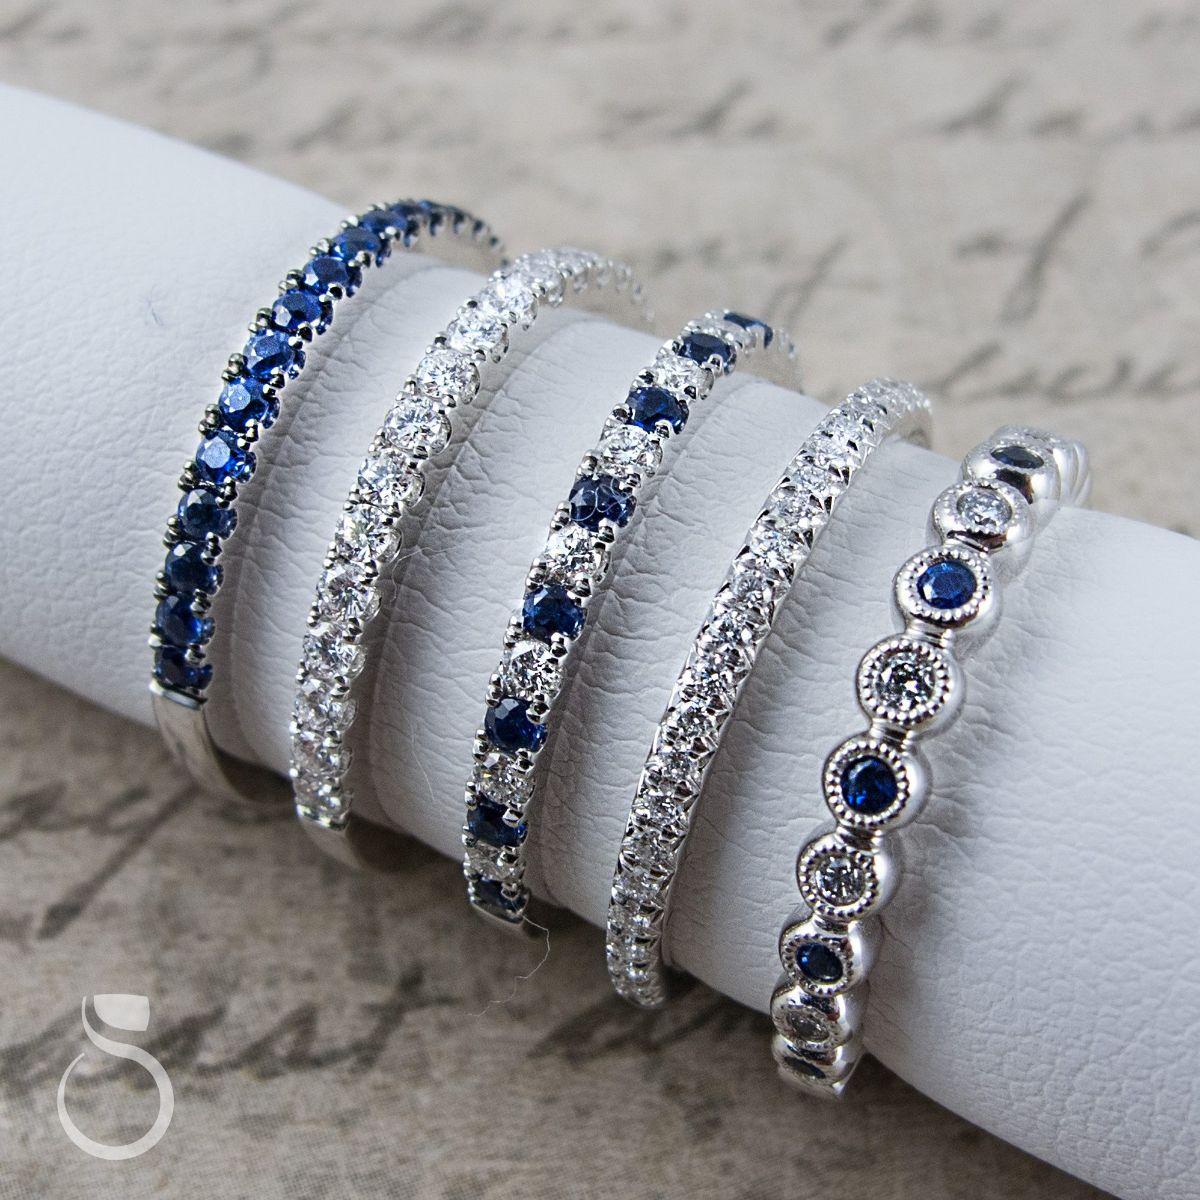 Shop Sylvie Rings